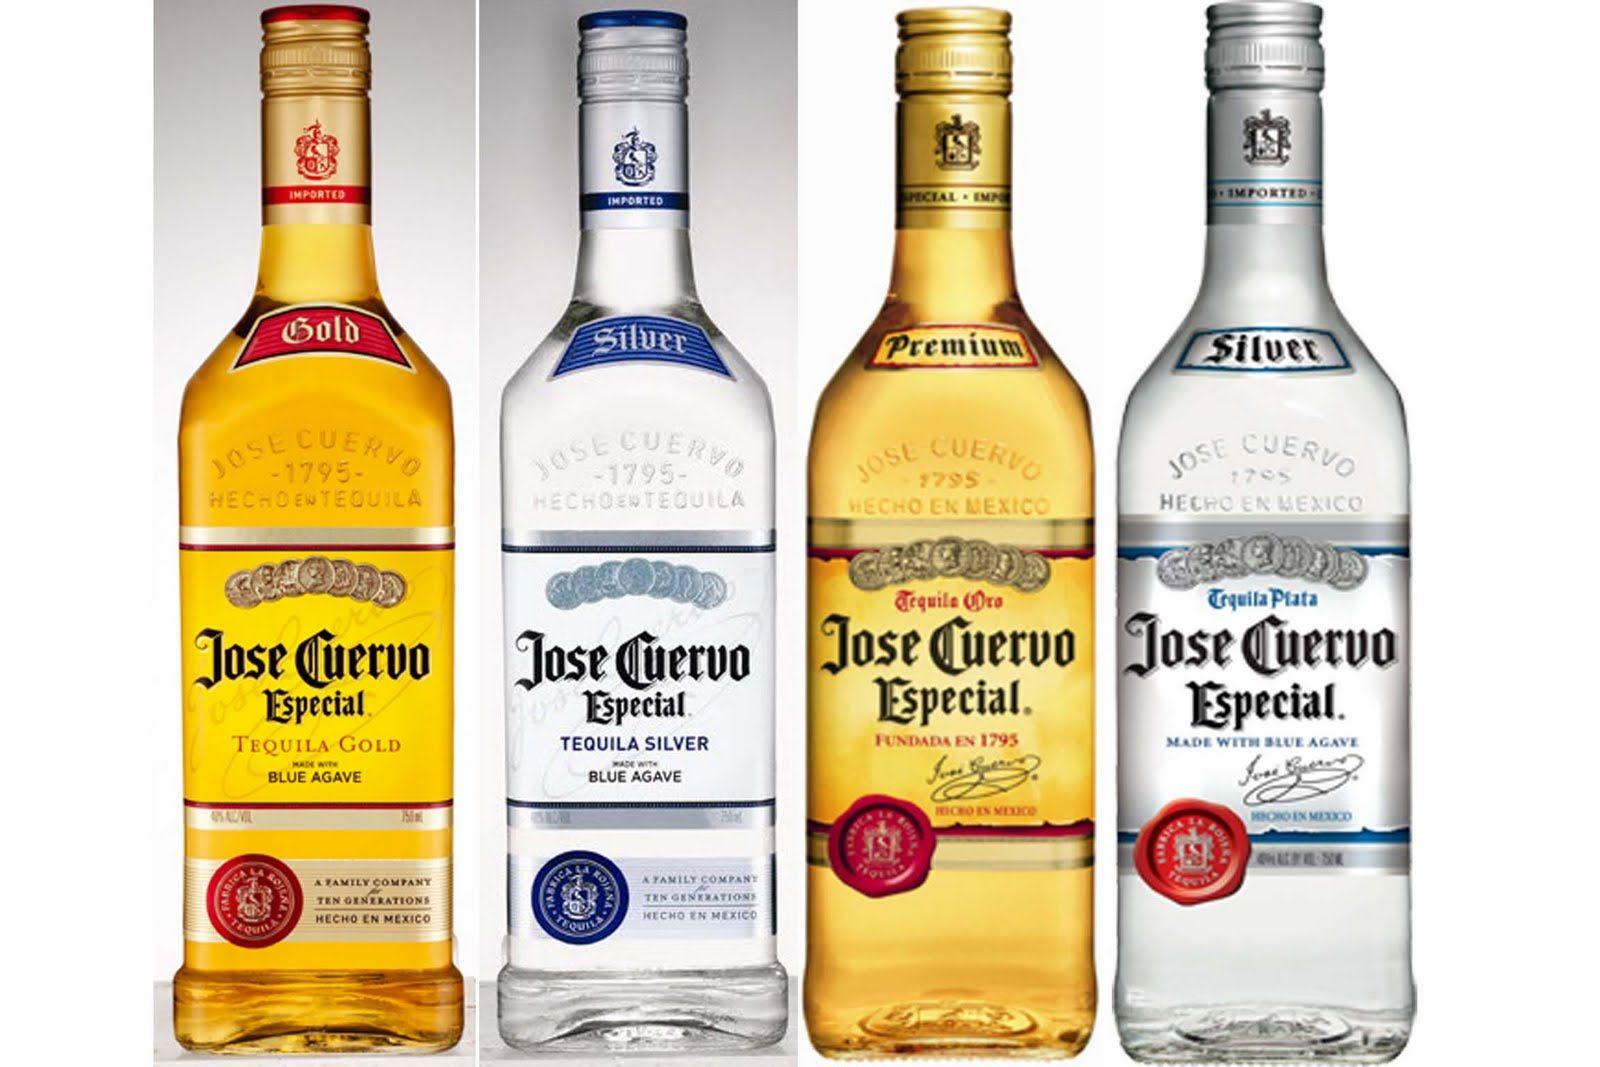 Tequila Jose Cuervo | Botellas de Vino | Pinterest | Jose cuervo